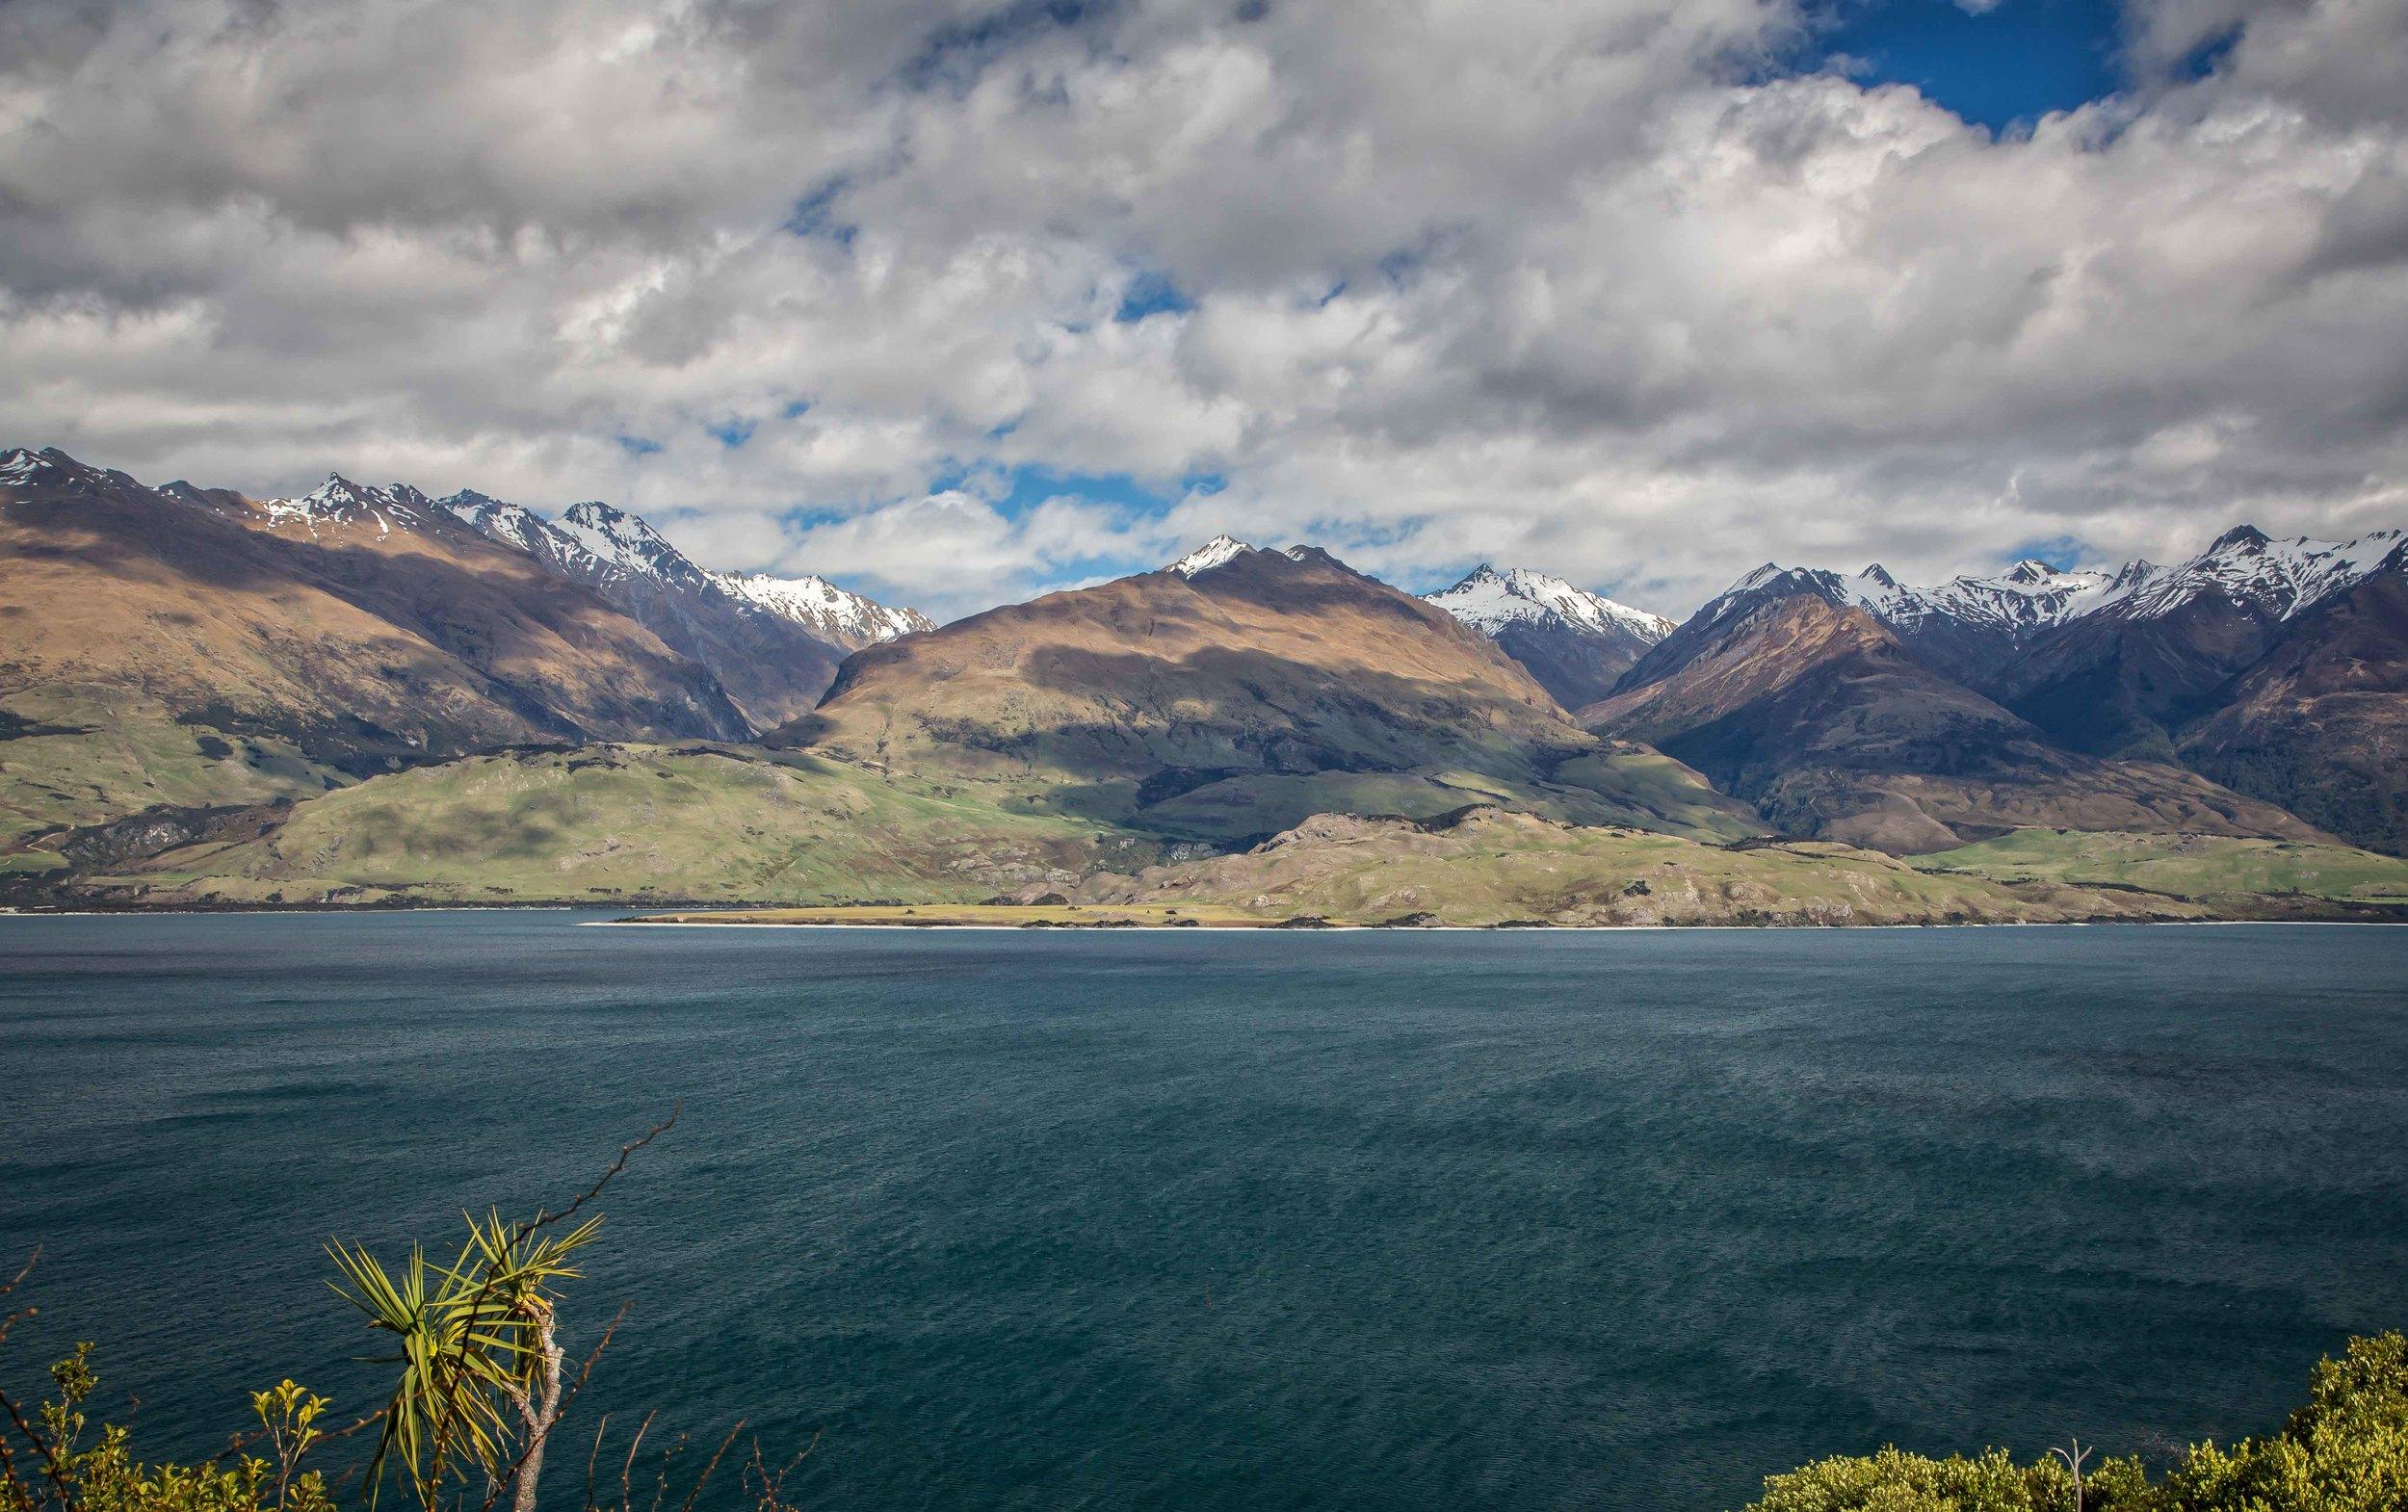 Boundary Creek Scenic Reserve - Lake Wanaka - 24/10/14